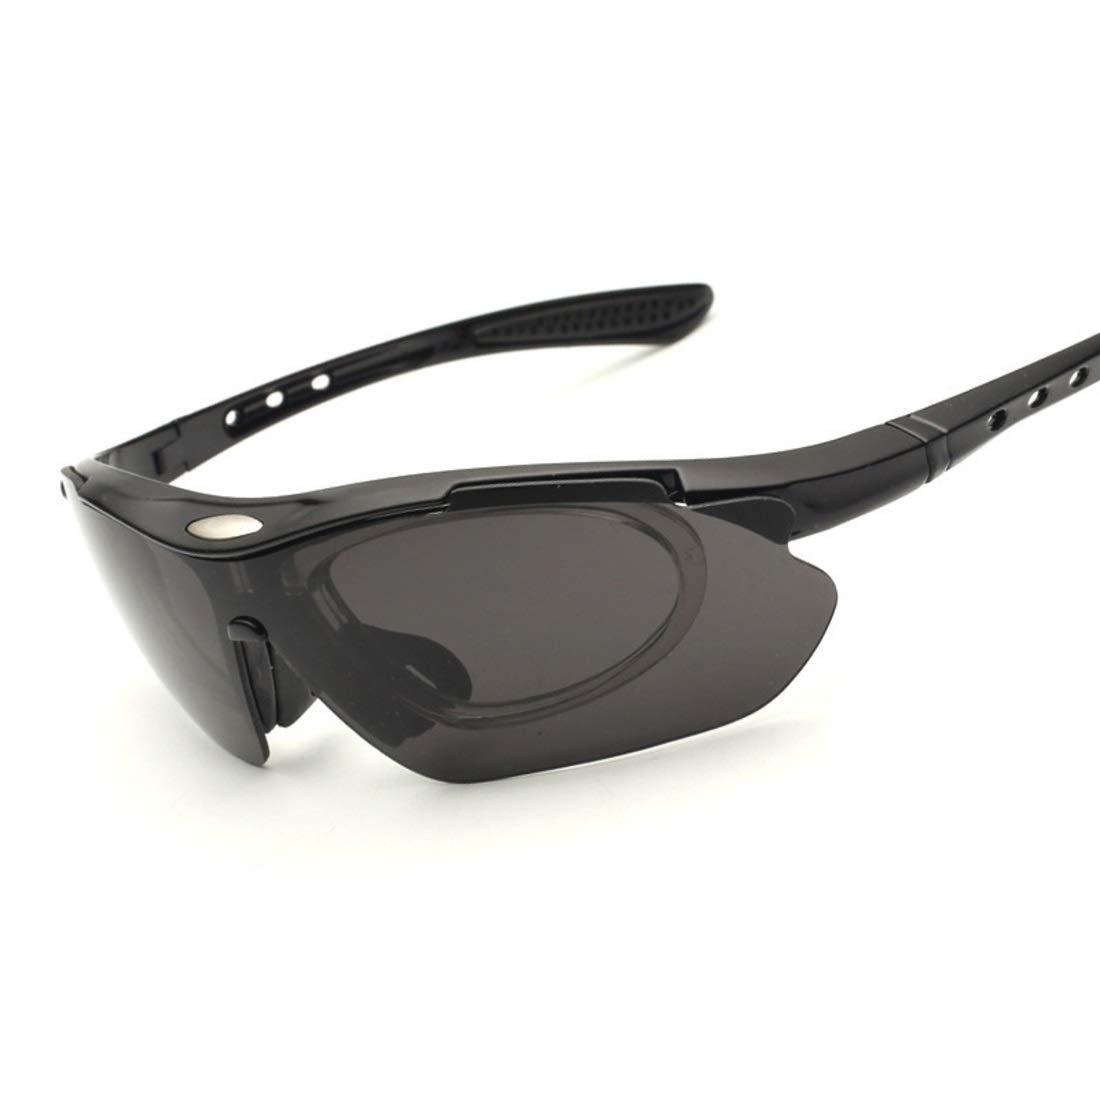 BAOYIT Outdoor Sports Riding Glasses Five-Piece Lens Set Sunglasses Mountain Bike Color Riding Glasses for Men and Women (Color : One Frame Five Piece Lens) by BAOYIT